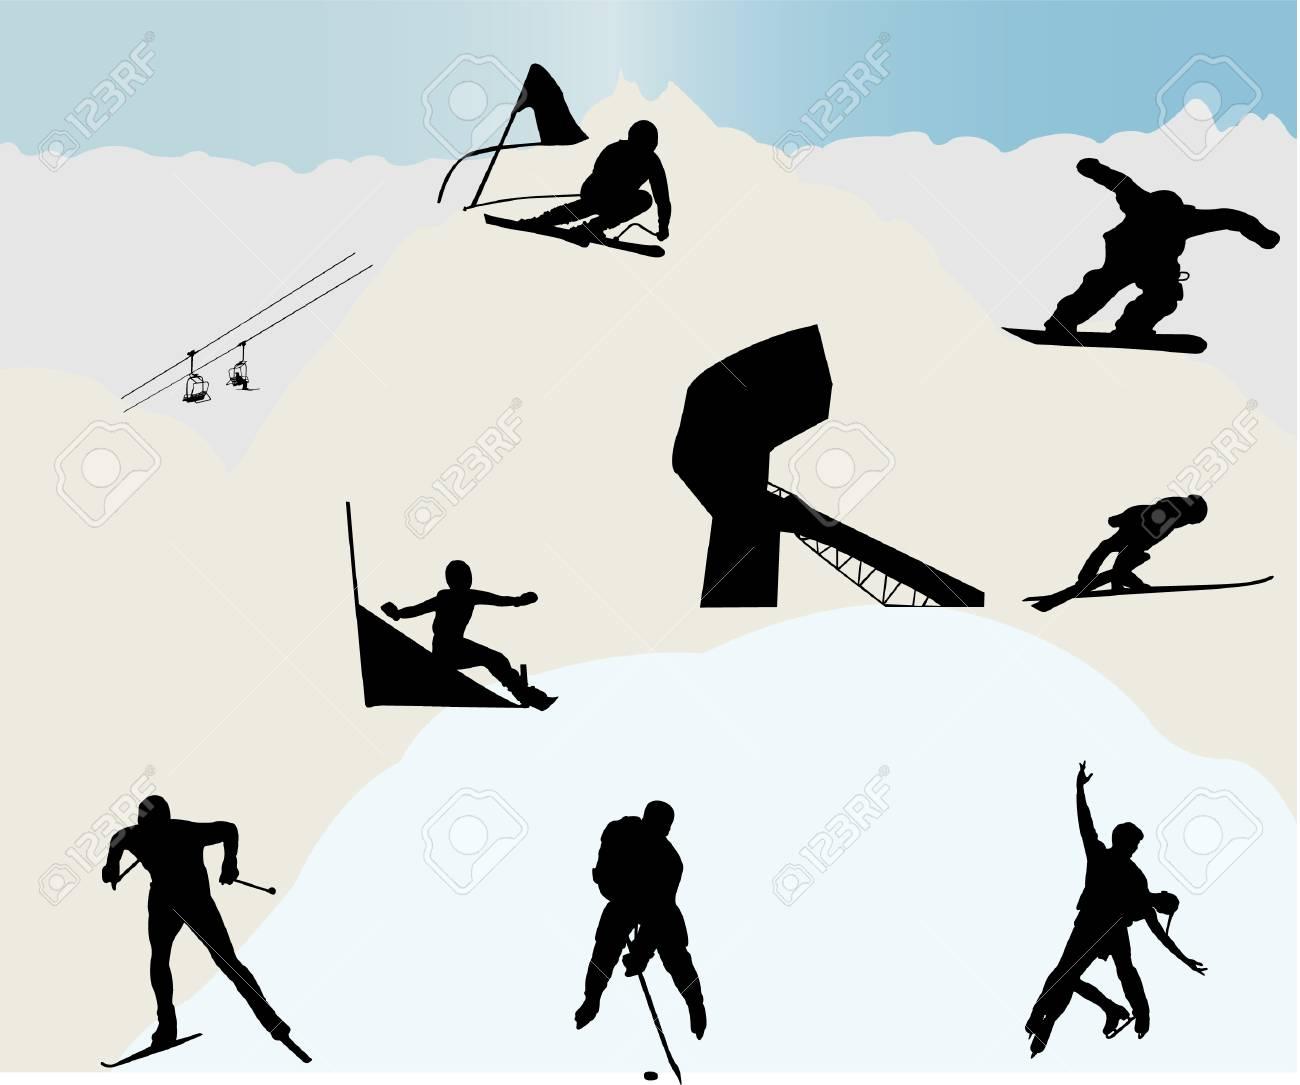 Winter sports Stock Vector - 6439287